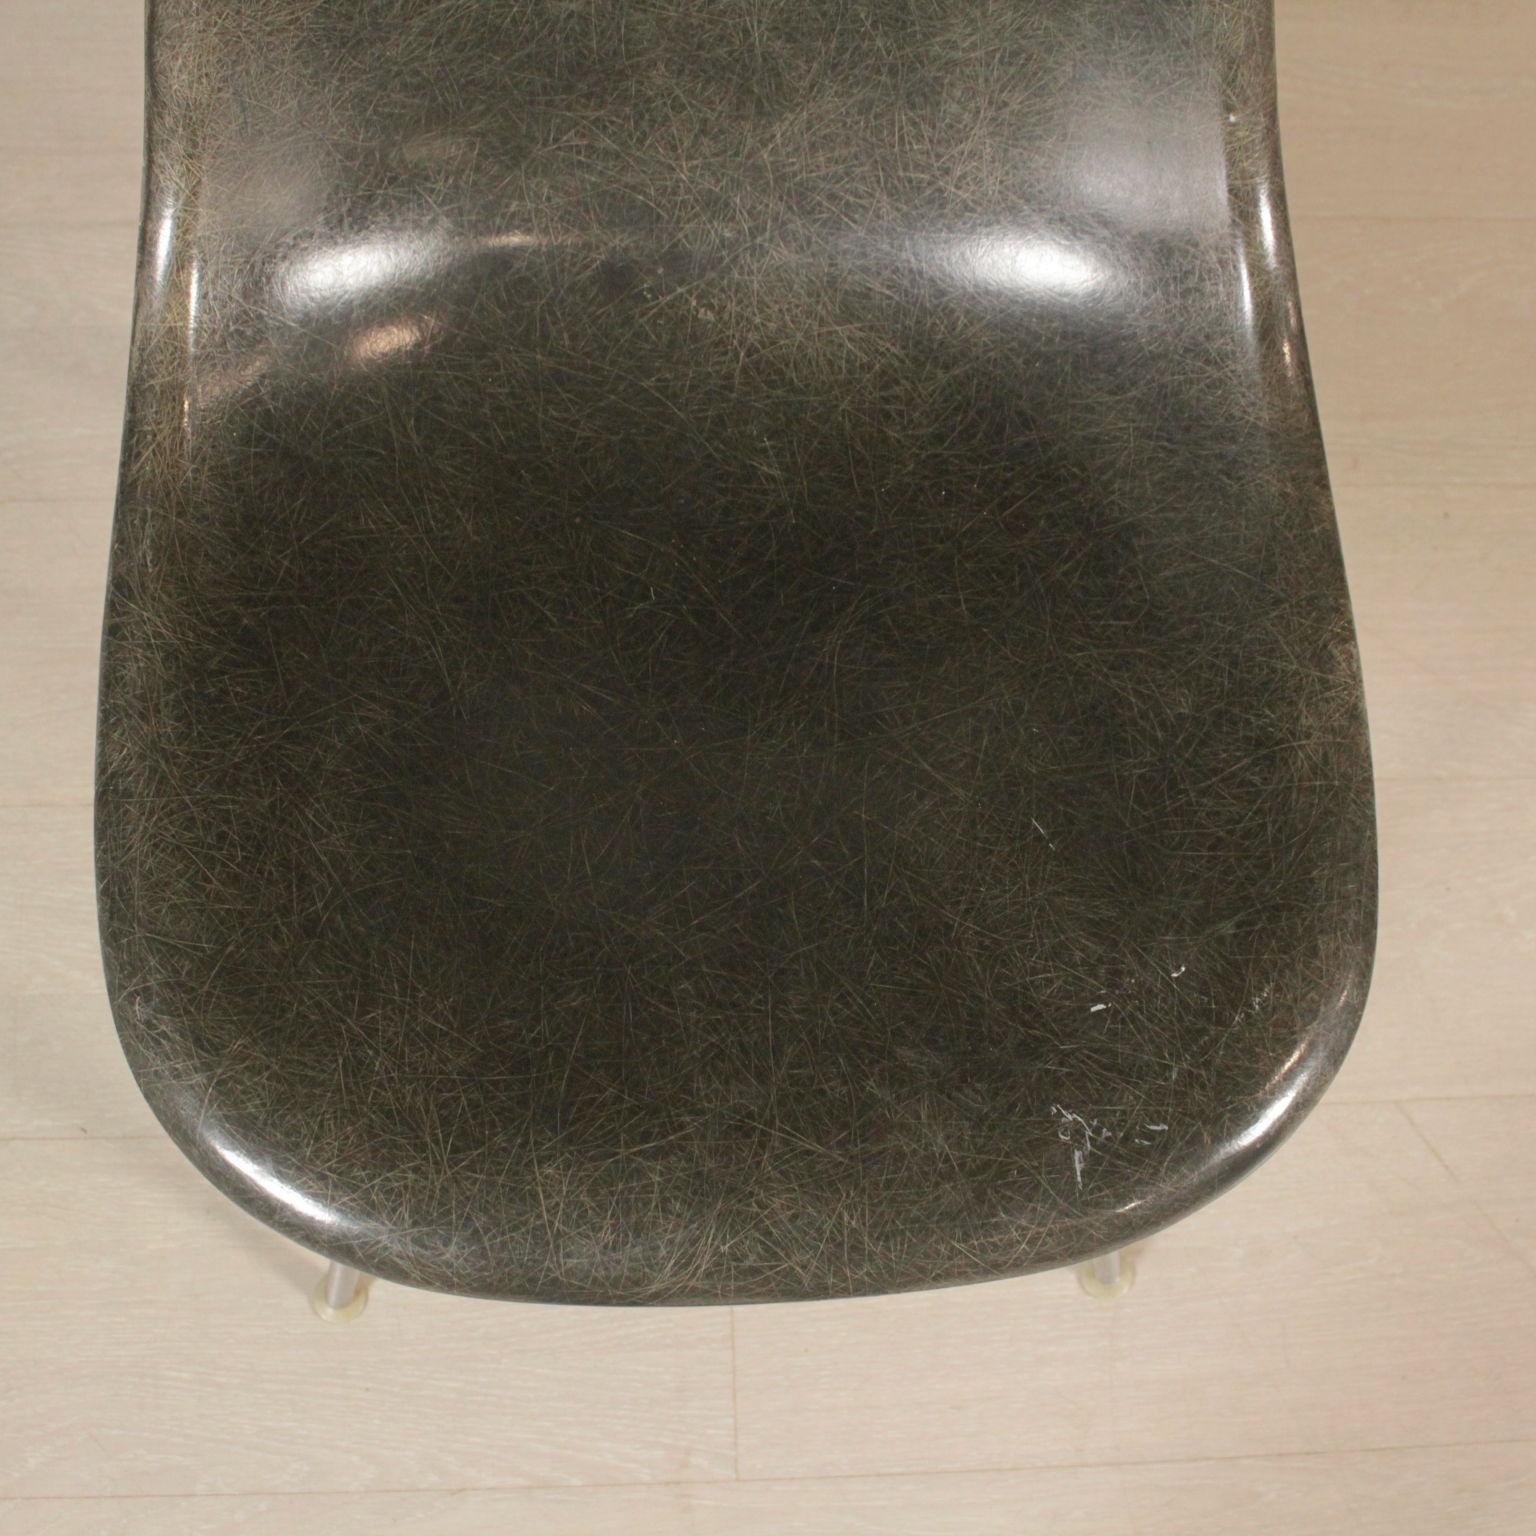 Sedia charles eames sedie modernariato for Sedia particolare